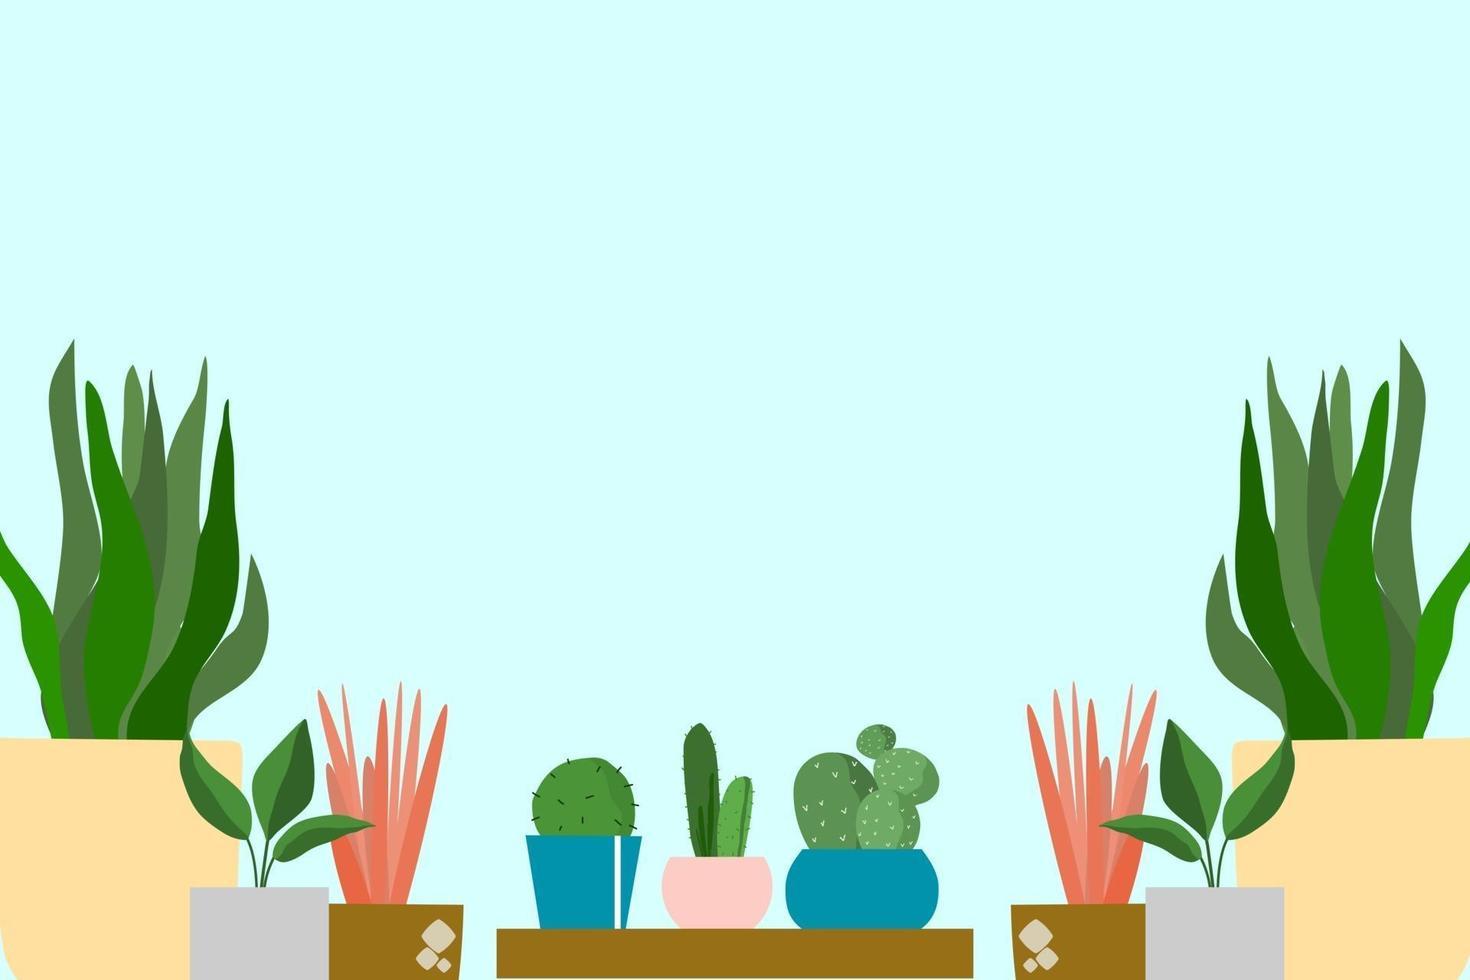 vetor de fundo de plantas decorativas